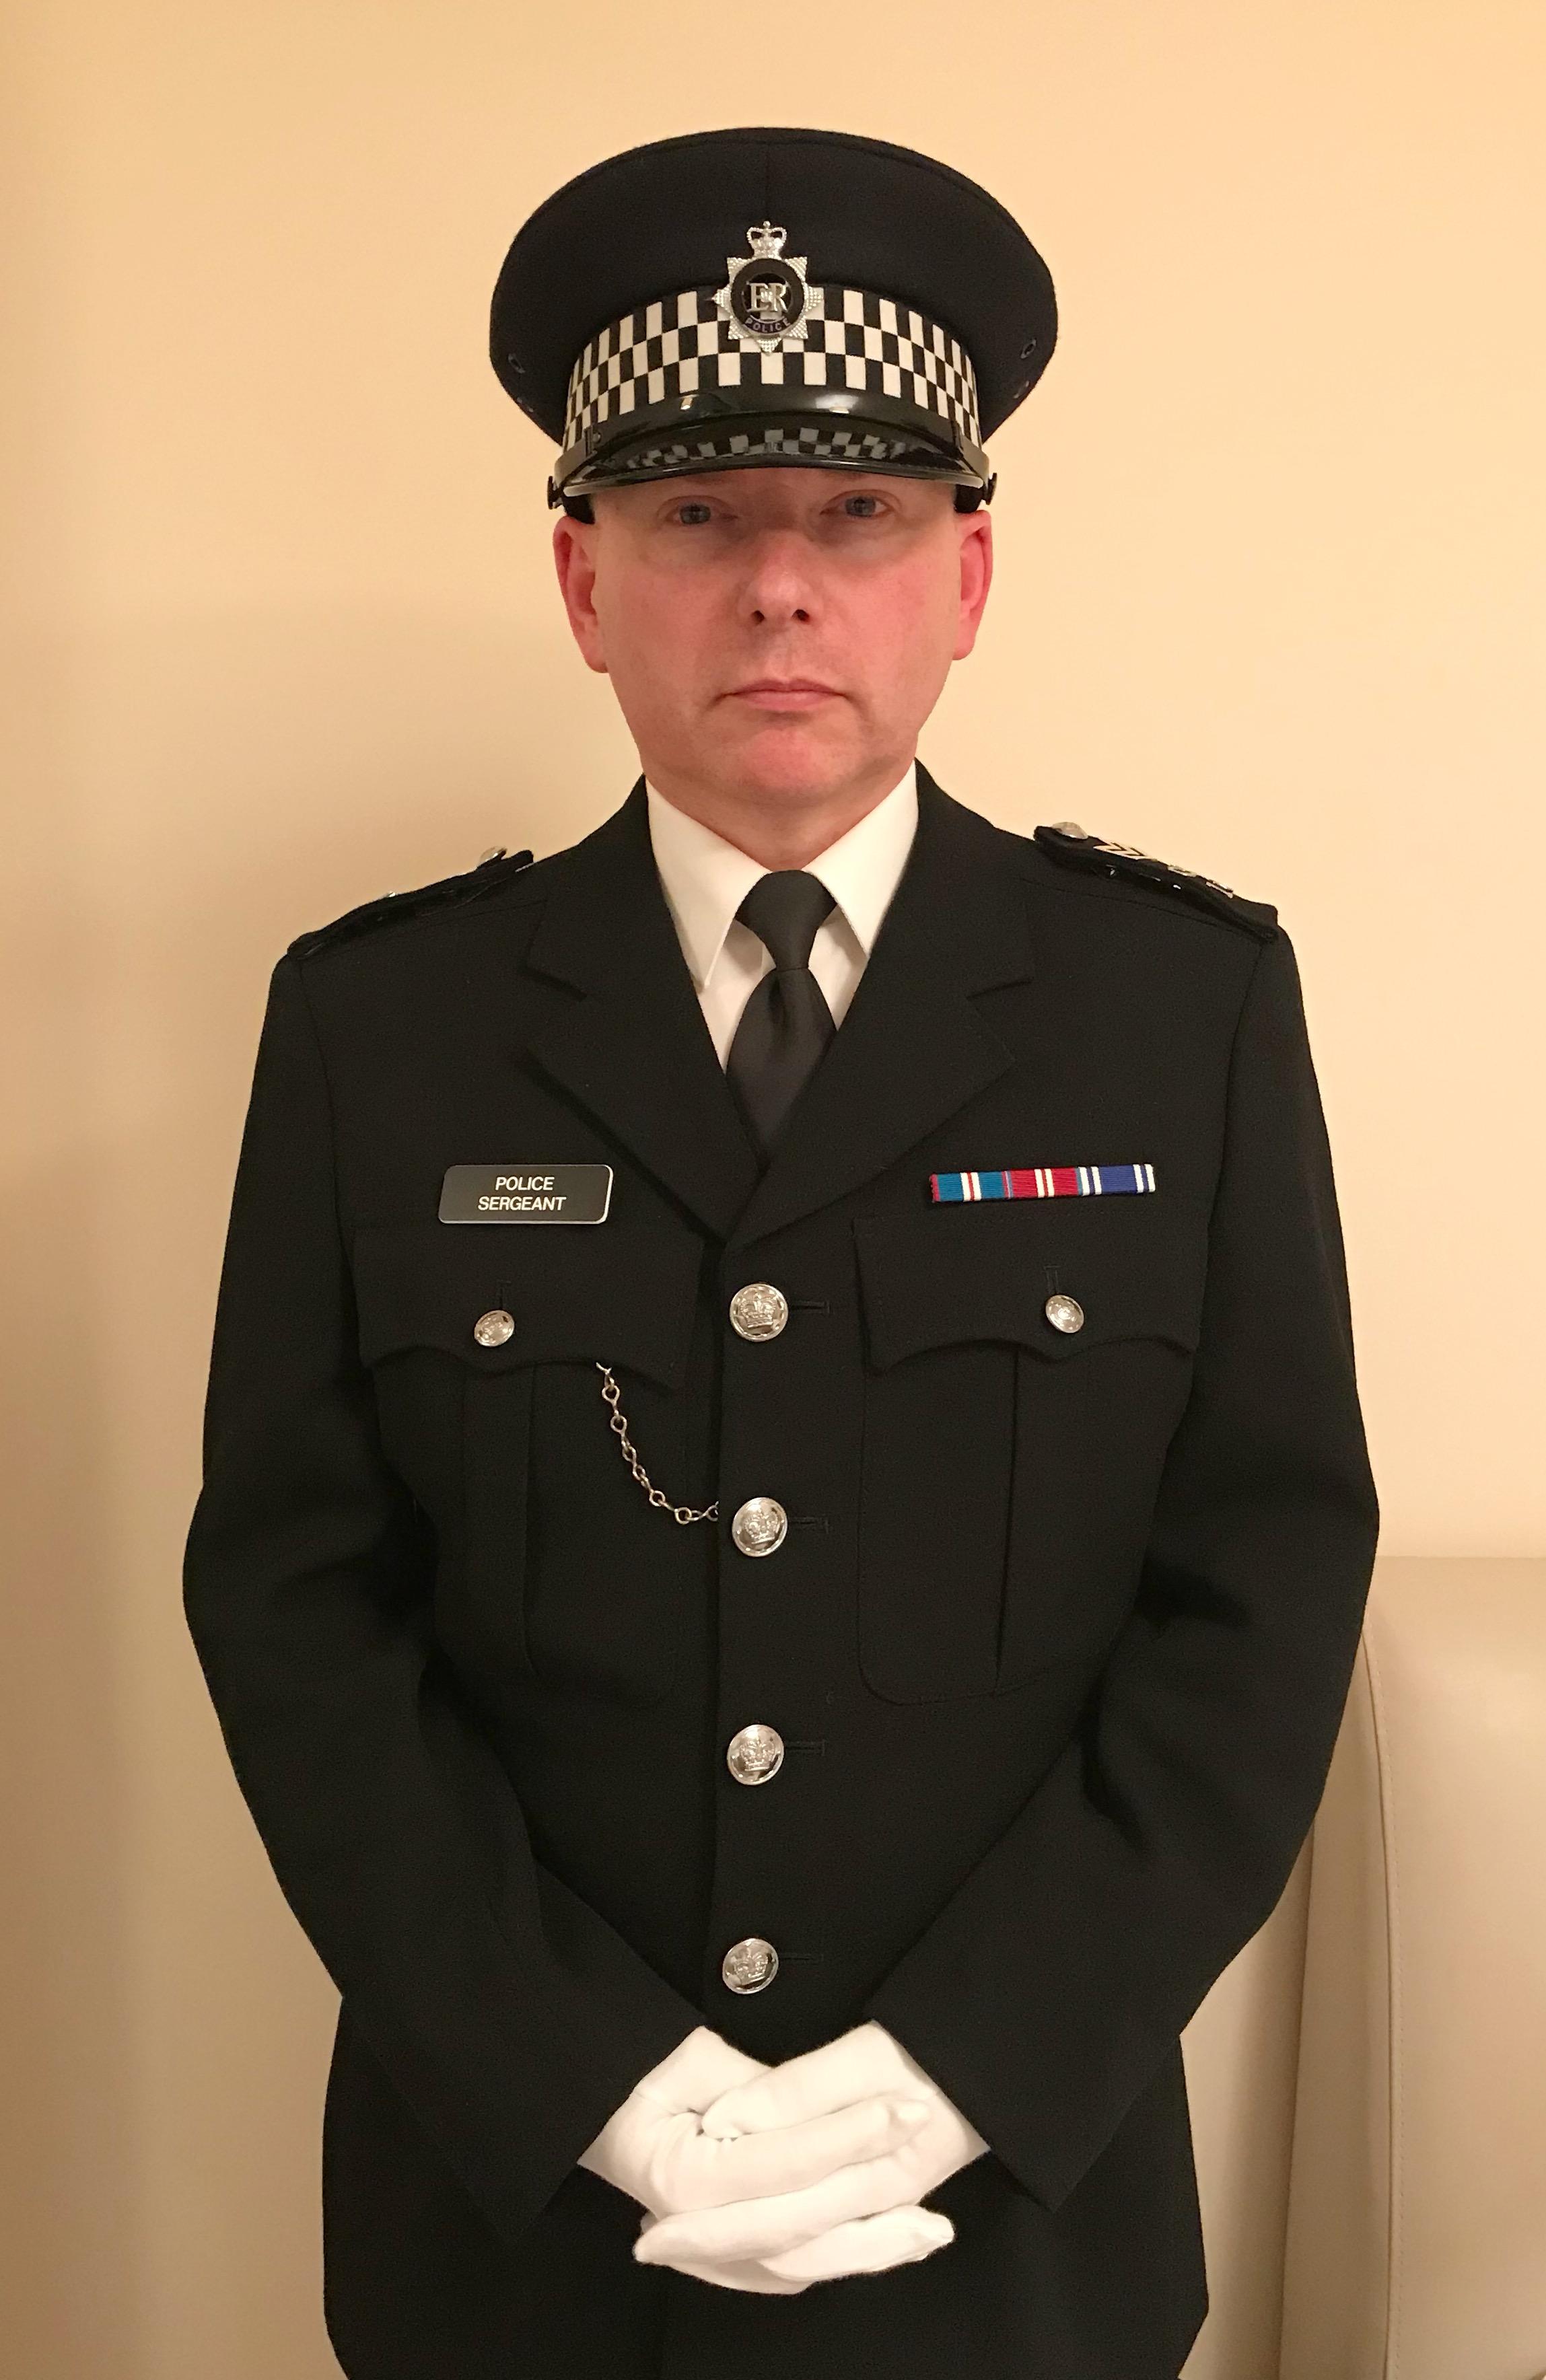 Dress Tunic Police